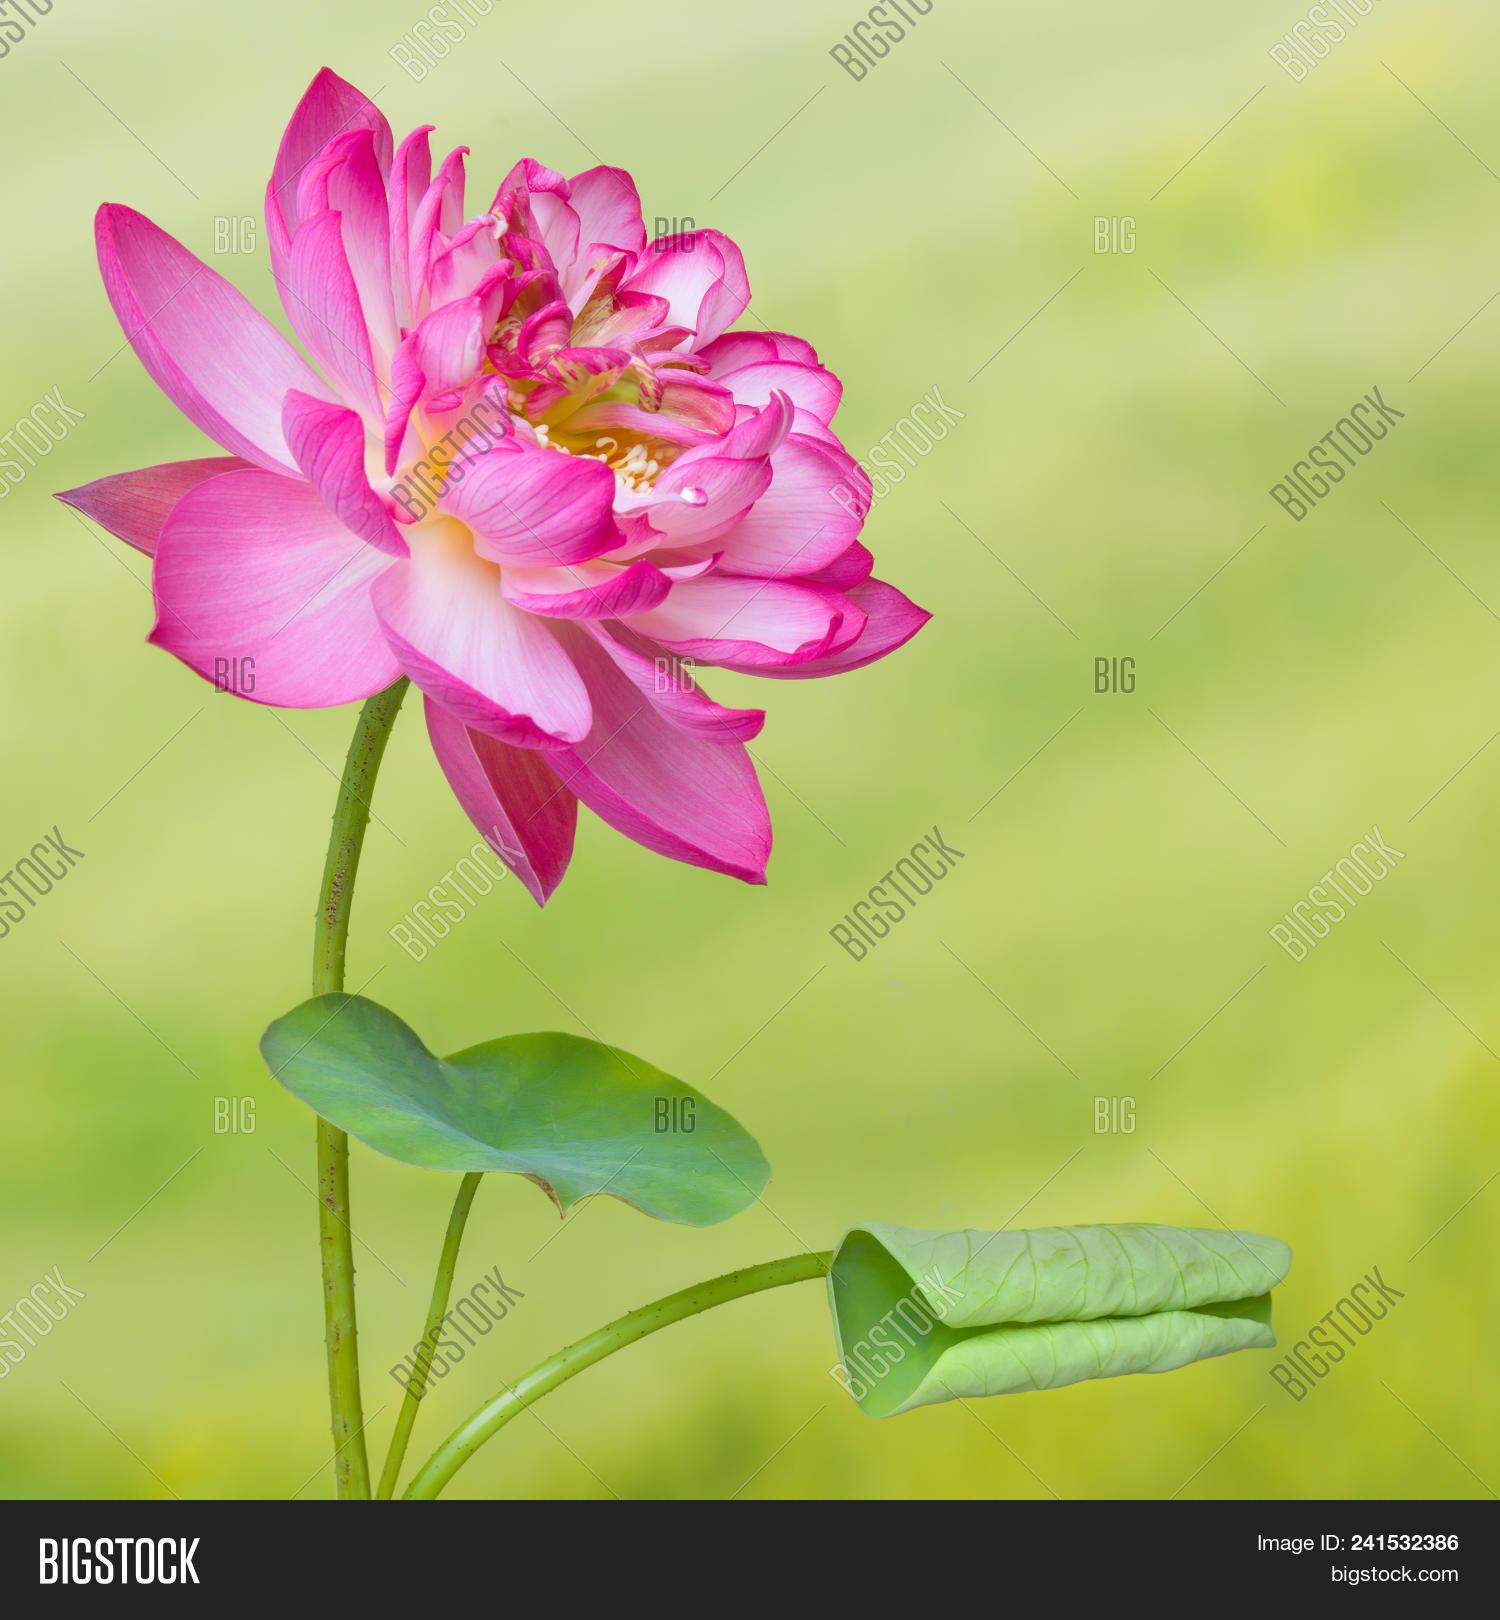 Full bloom lotus image photo free trial bigstock full bloom of a lotus flower named lotus nelumbo elite red izmirmasajfo